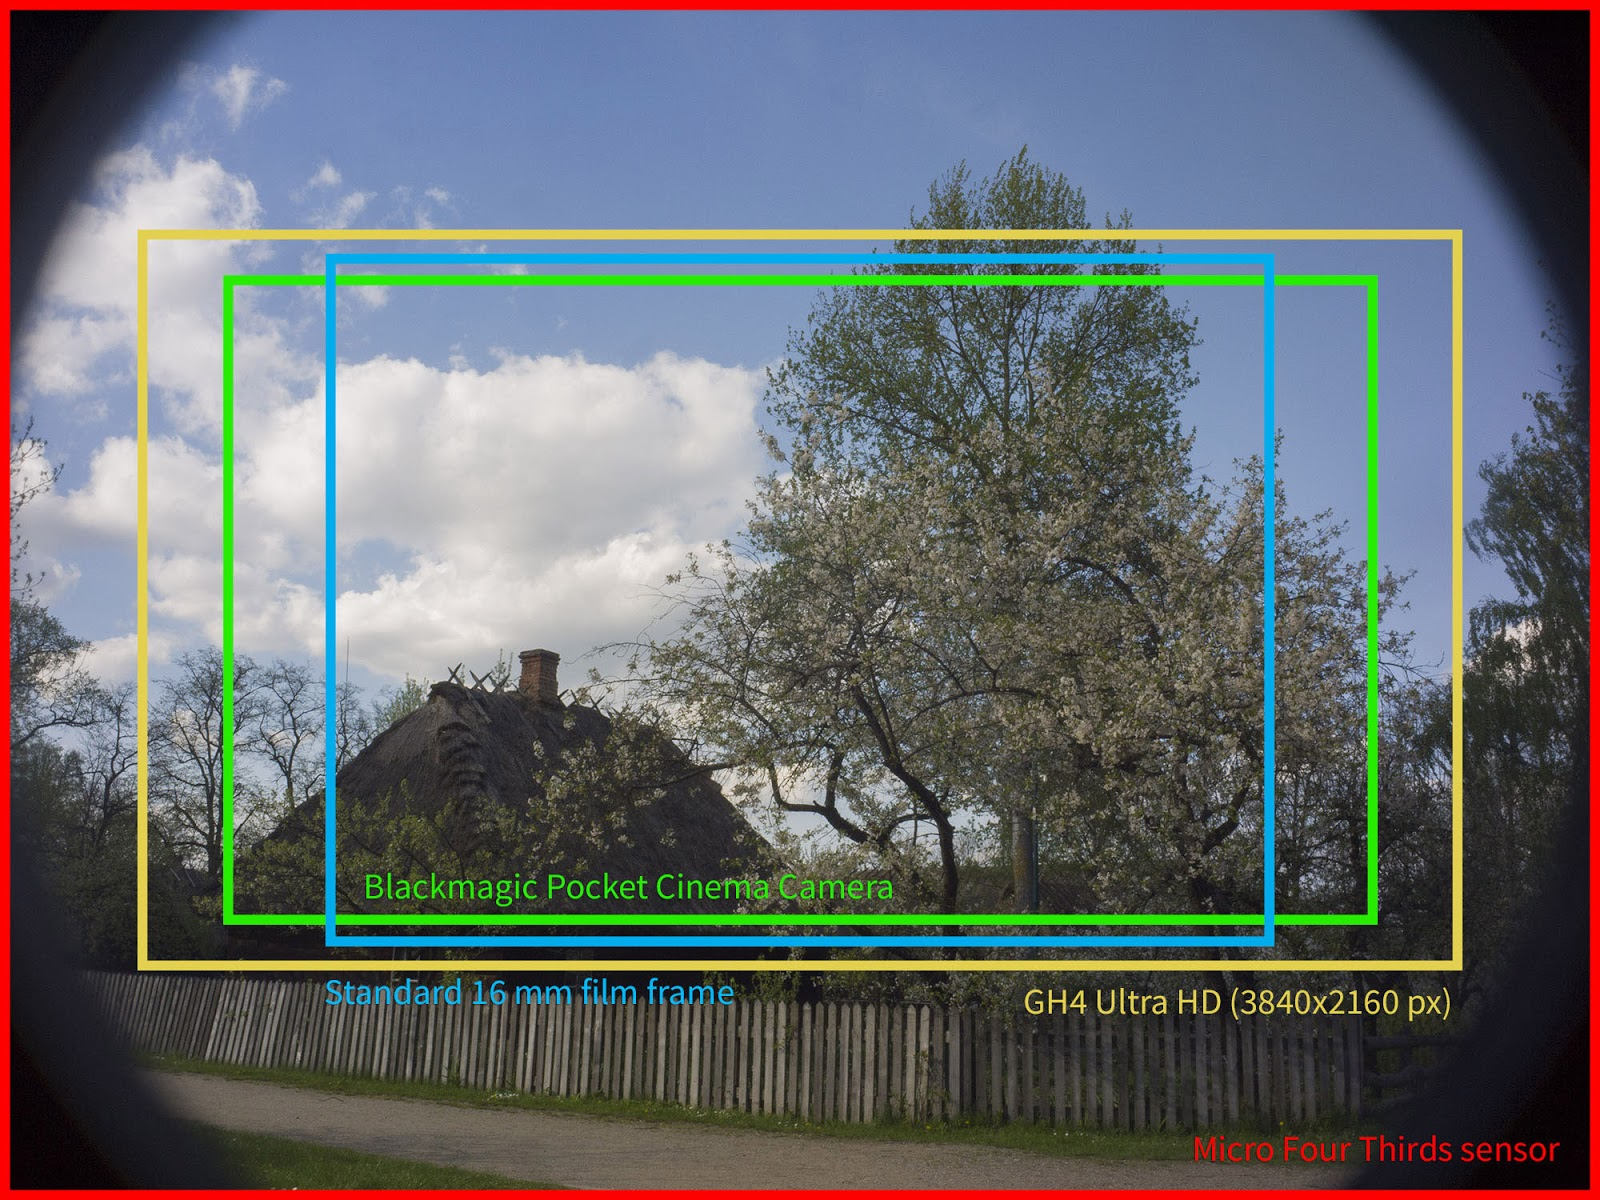 Tevidon 16/1.8 @16 - MFT, BMPCC, GH4 UltraHD sensor coverage.